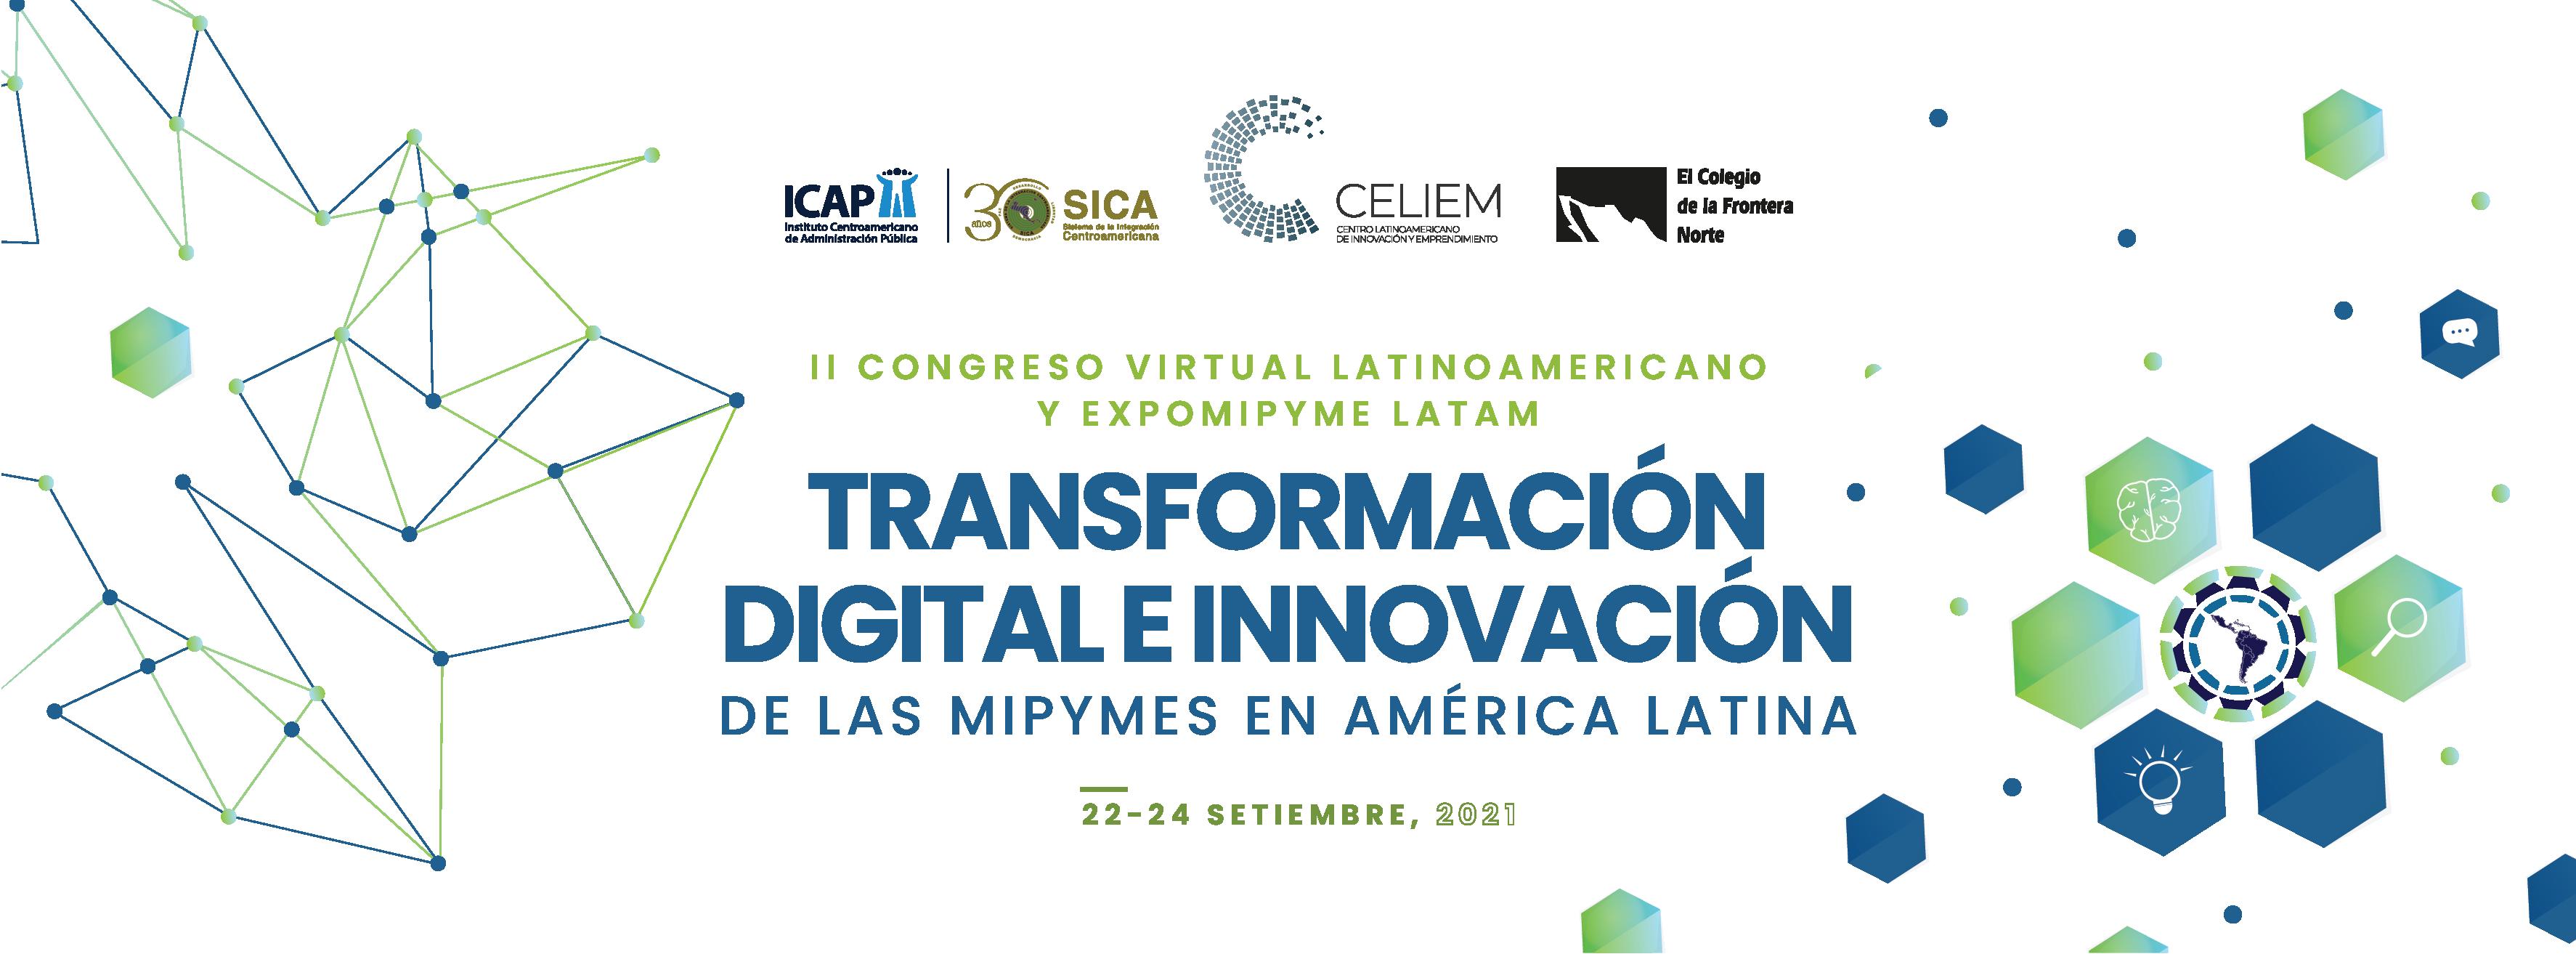 Transformación digital e innovación de las Mipymes en América Latina